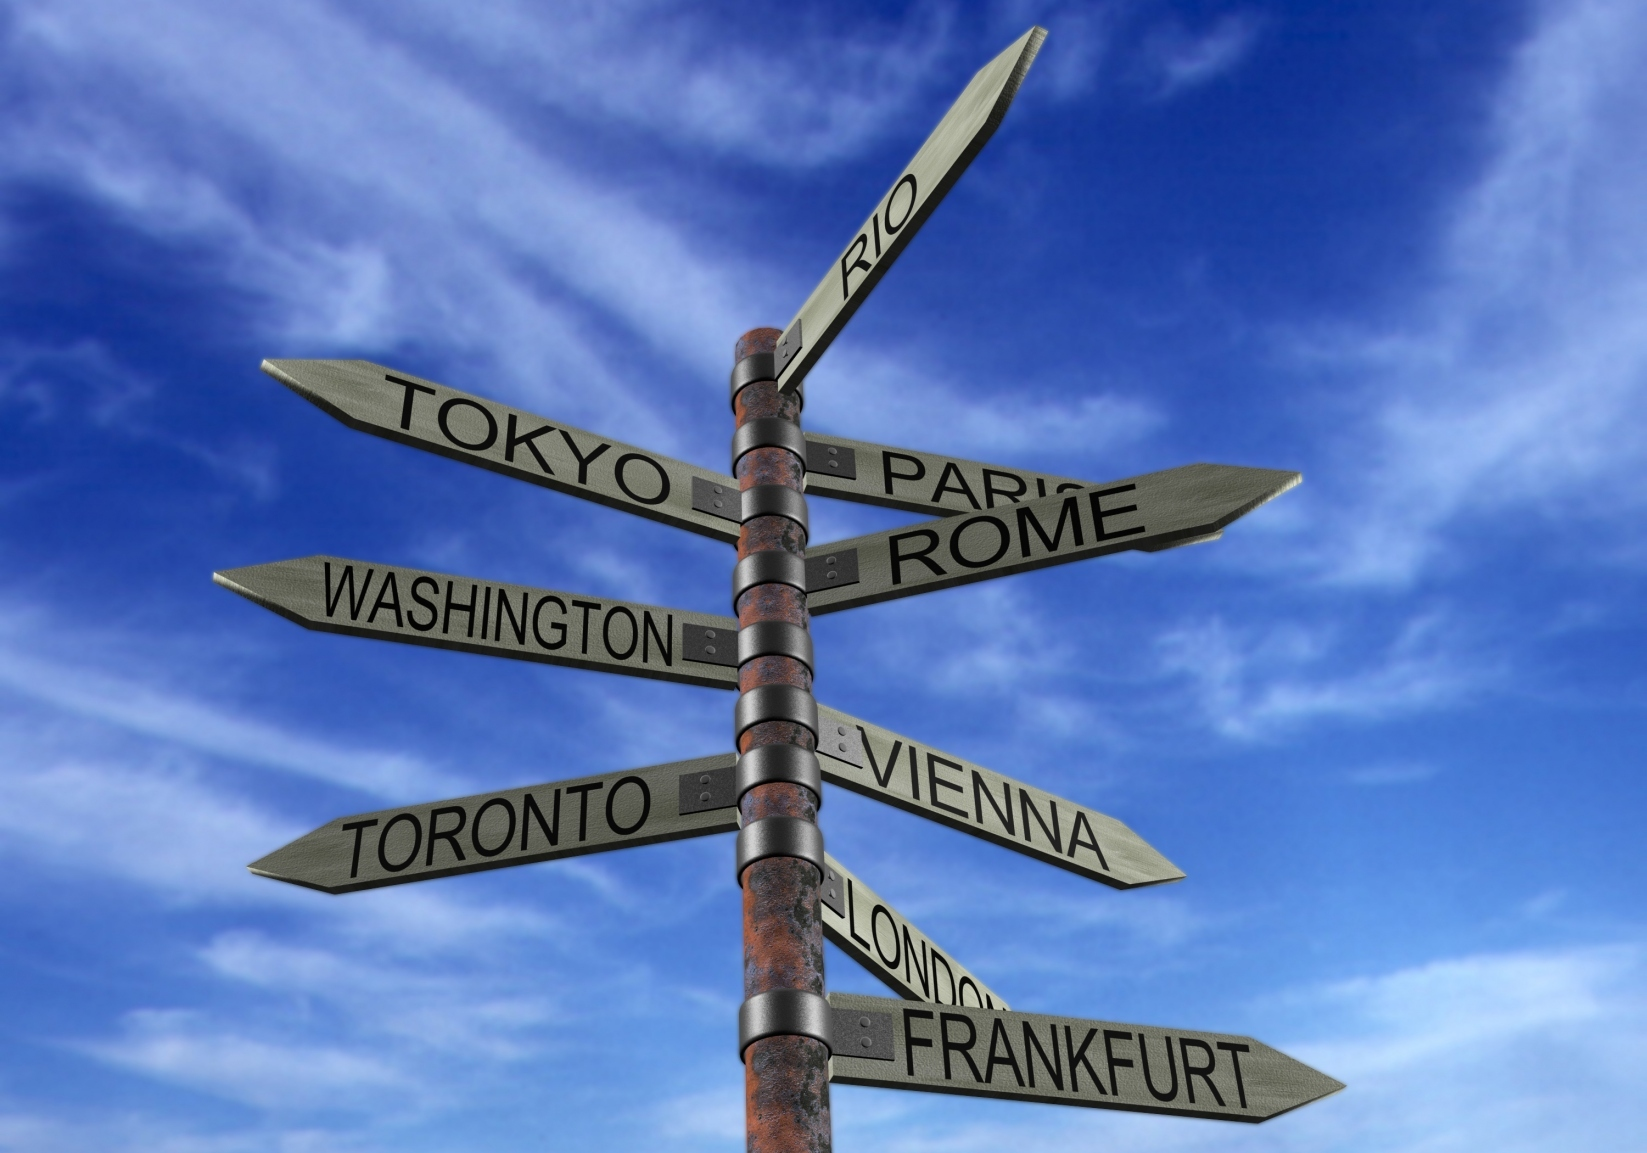 How to Choose a Destination As a First Time Traveler forecasting